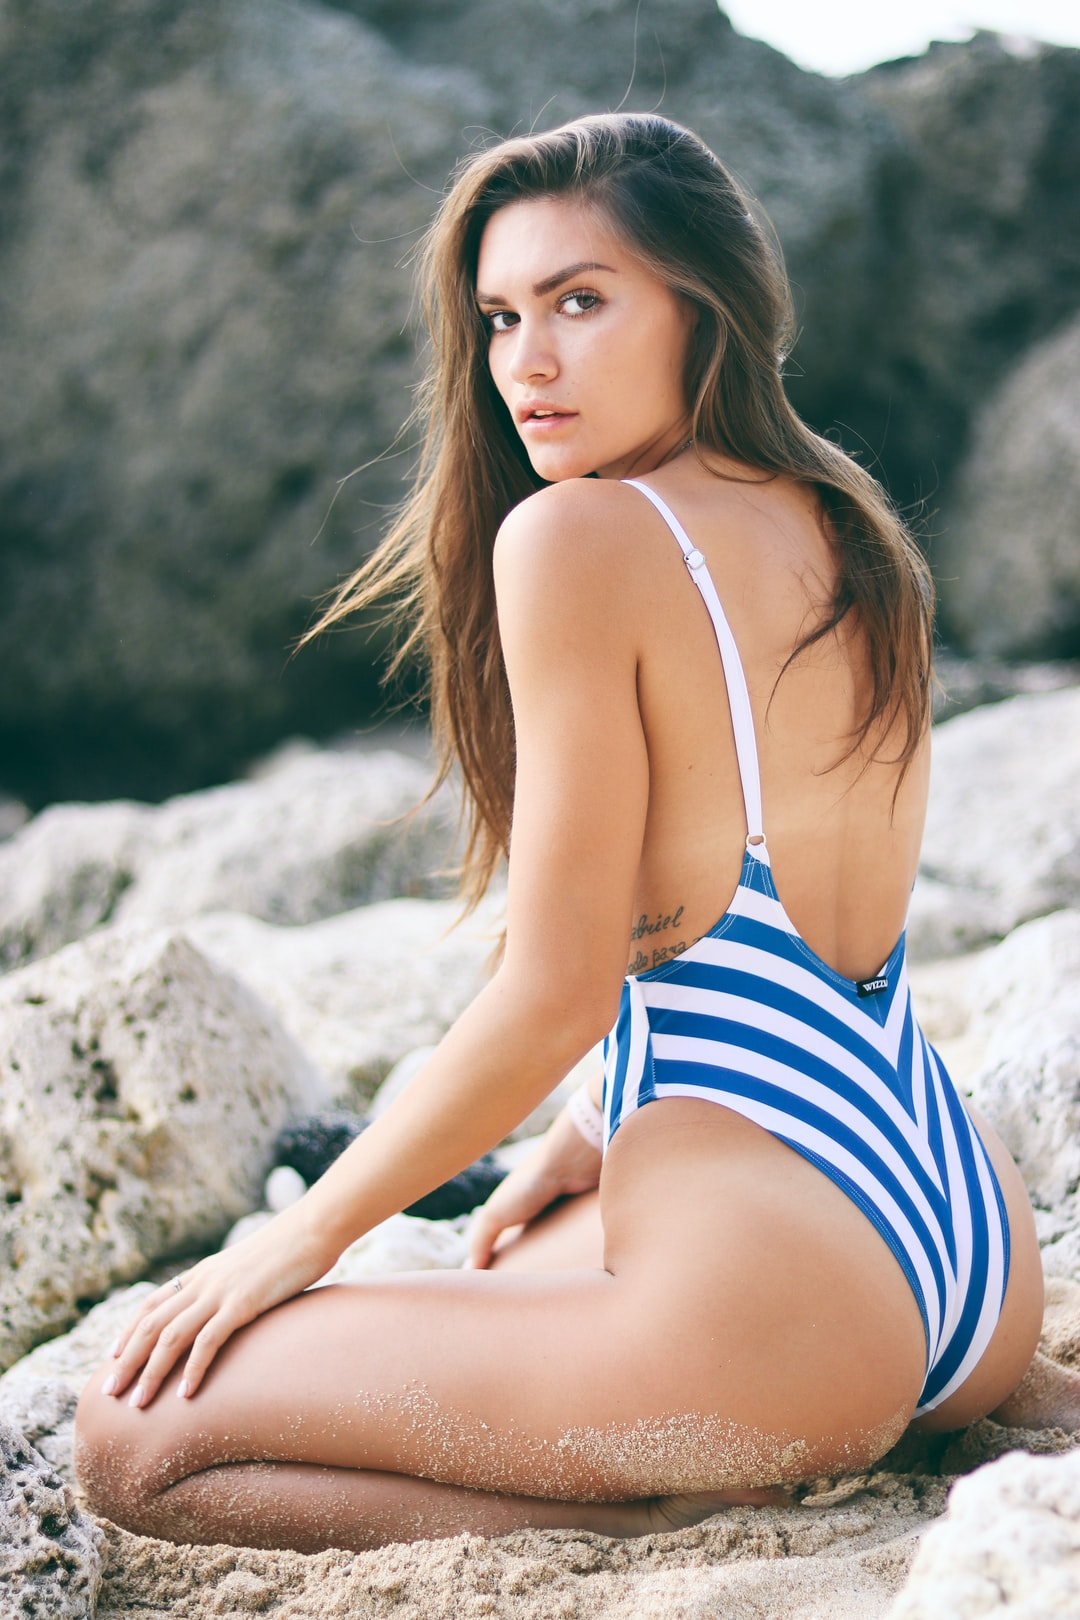 Celebrity Nude Images Free Download Scenes